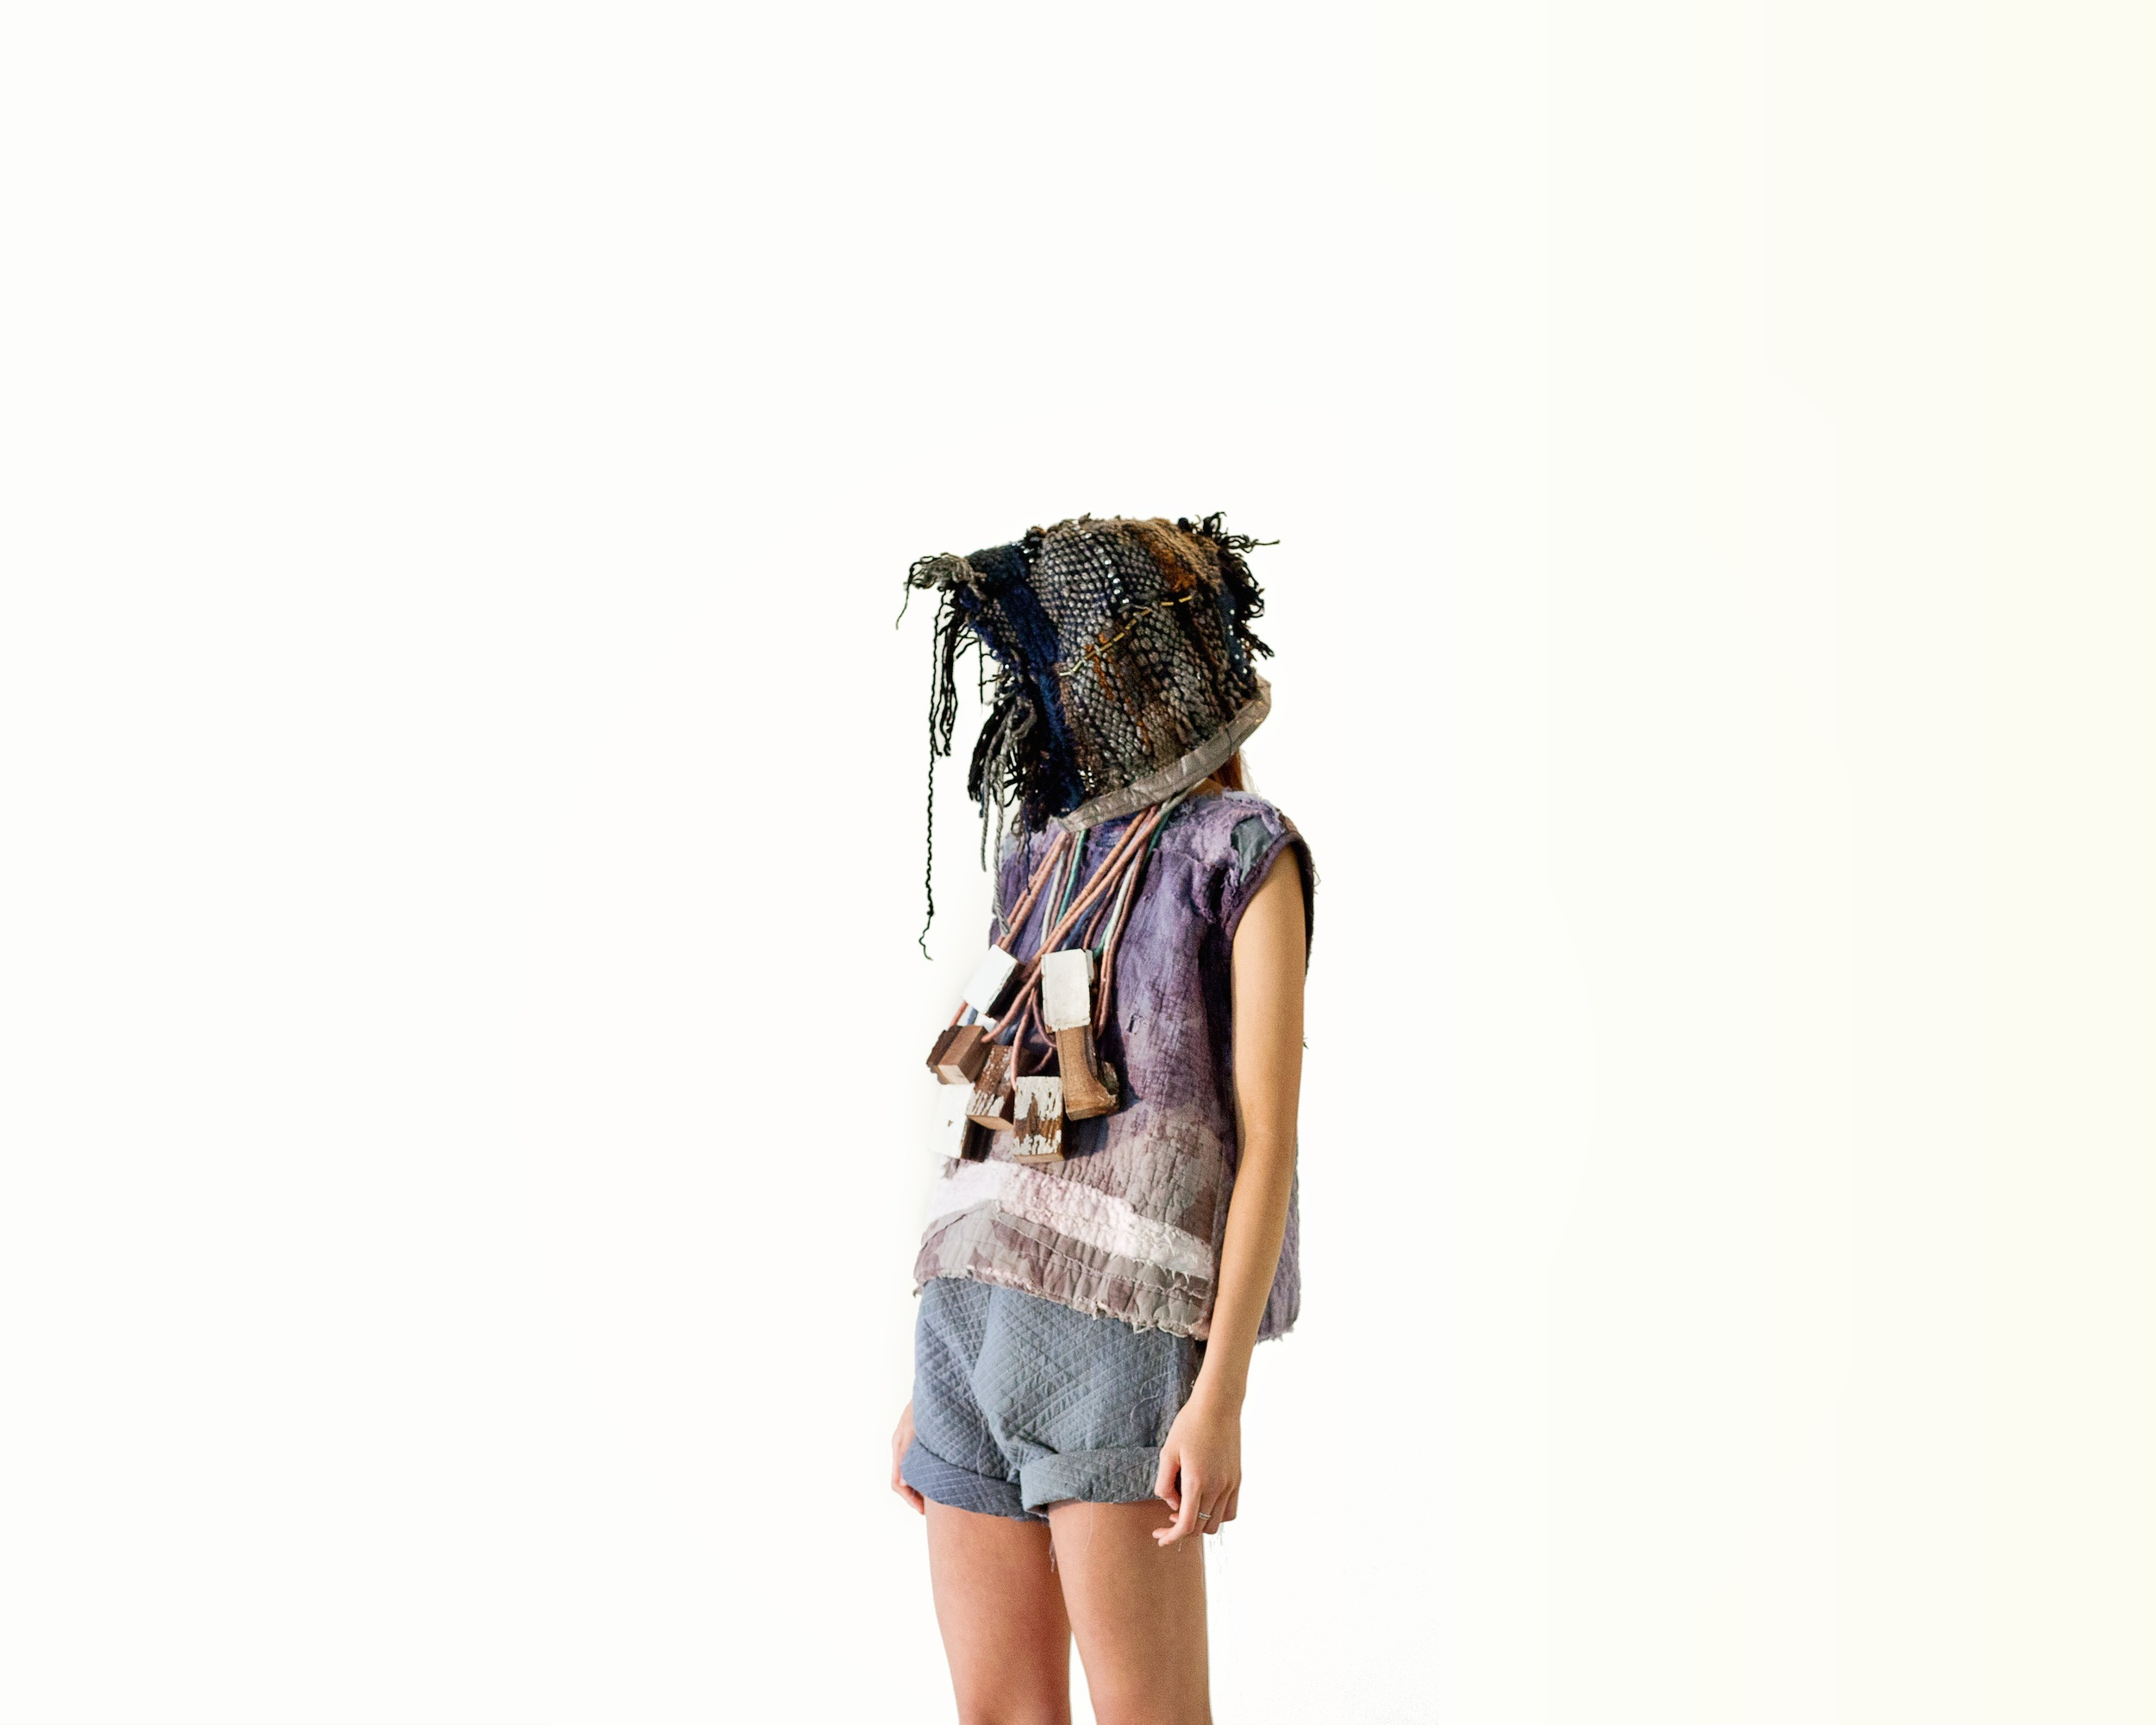 Grace_Blackhead_shorts_wide copy.jpg